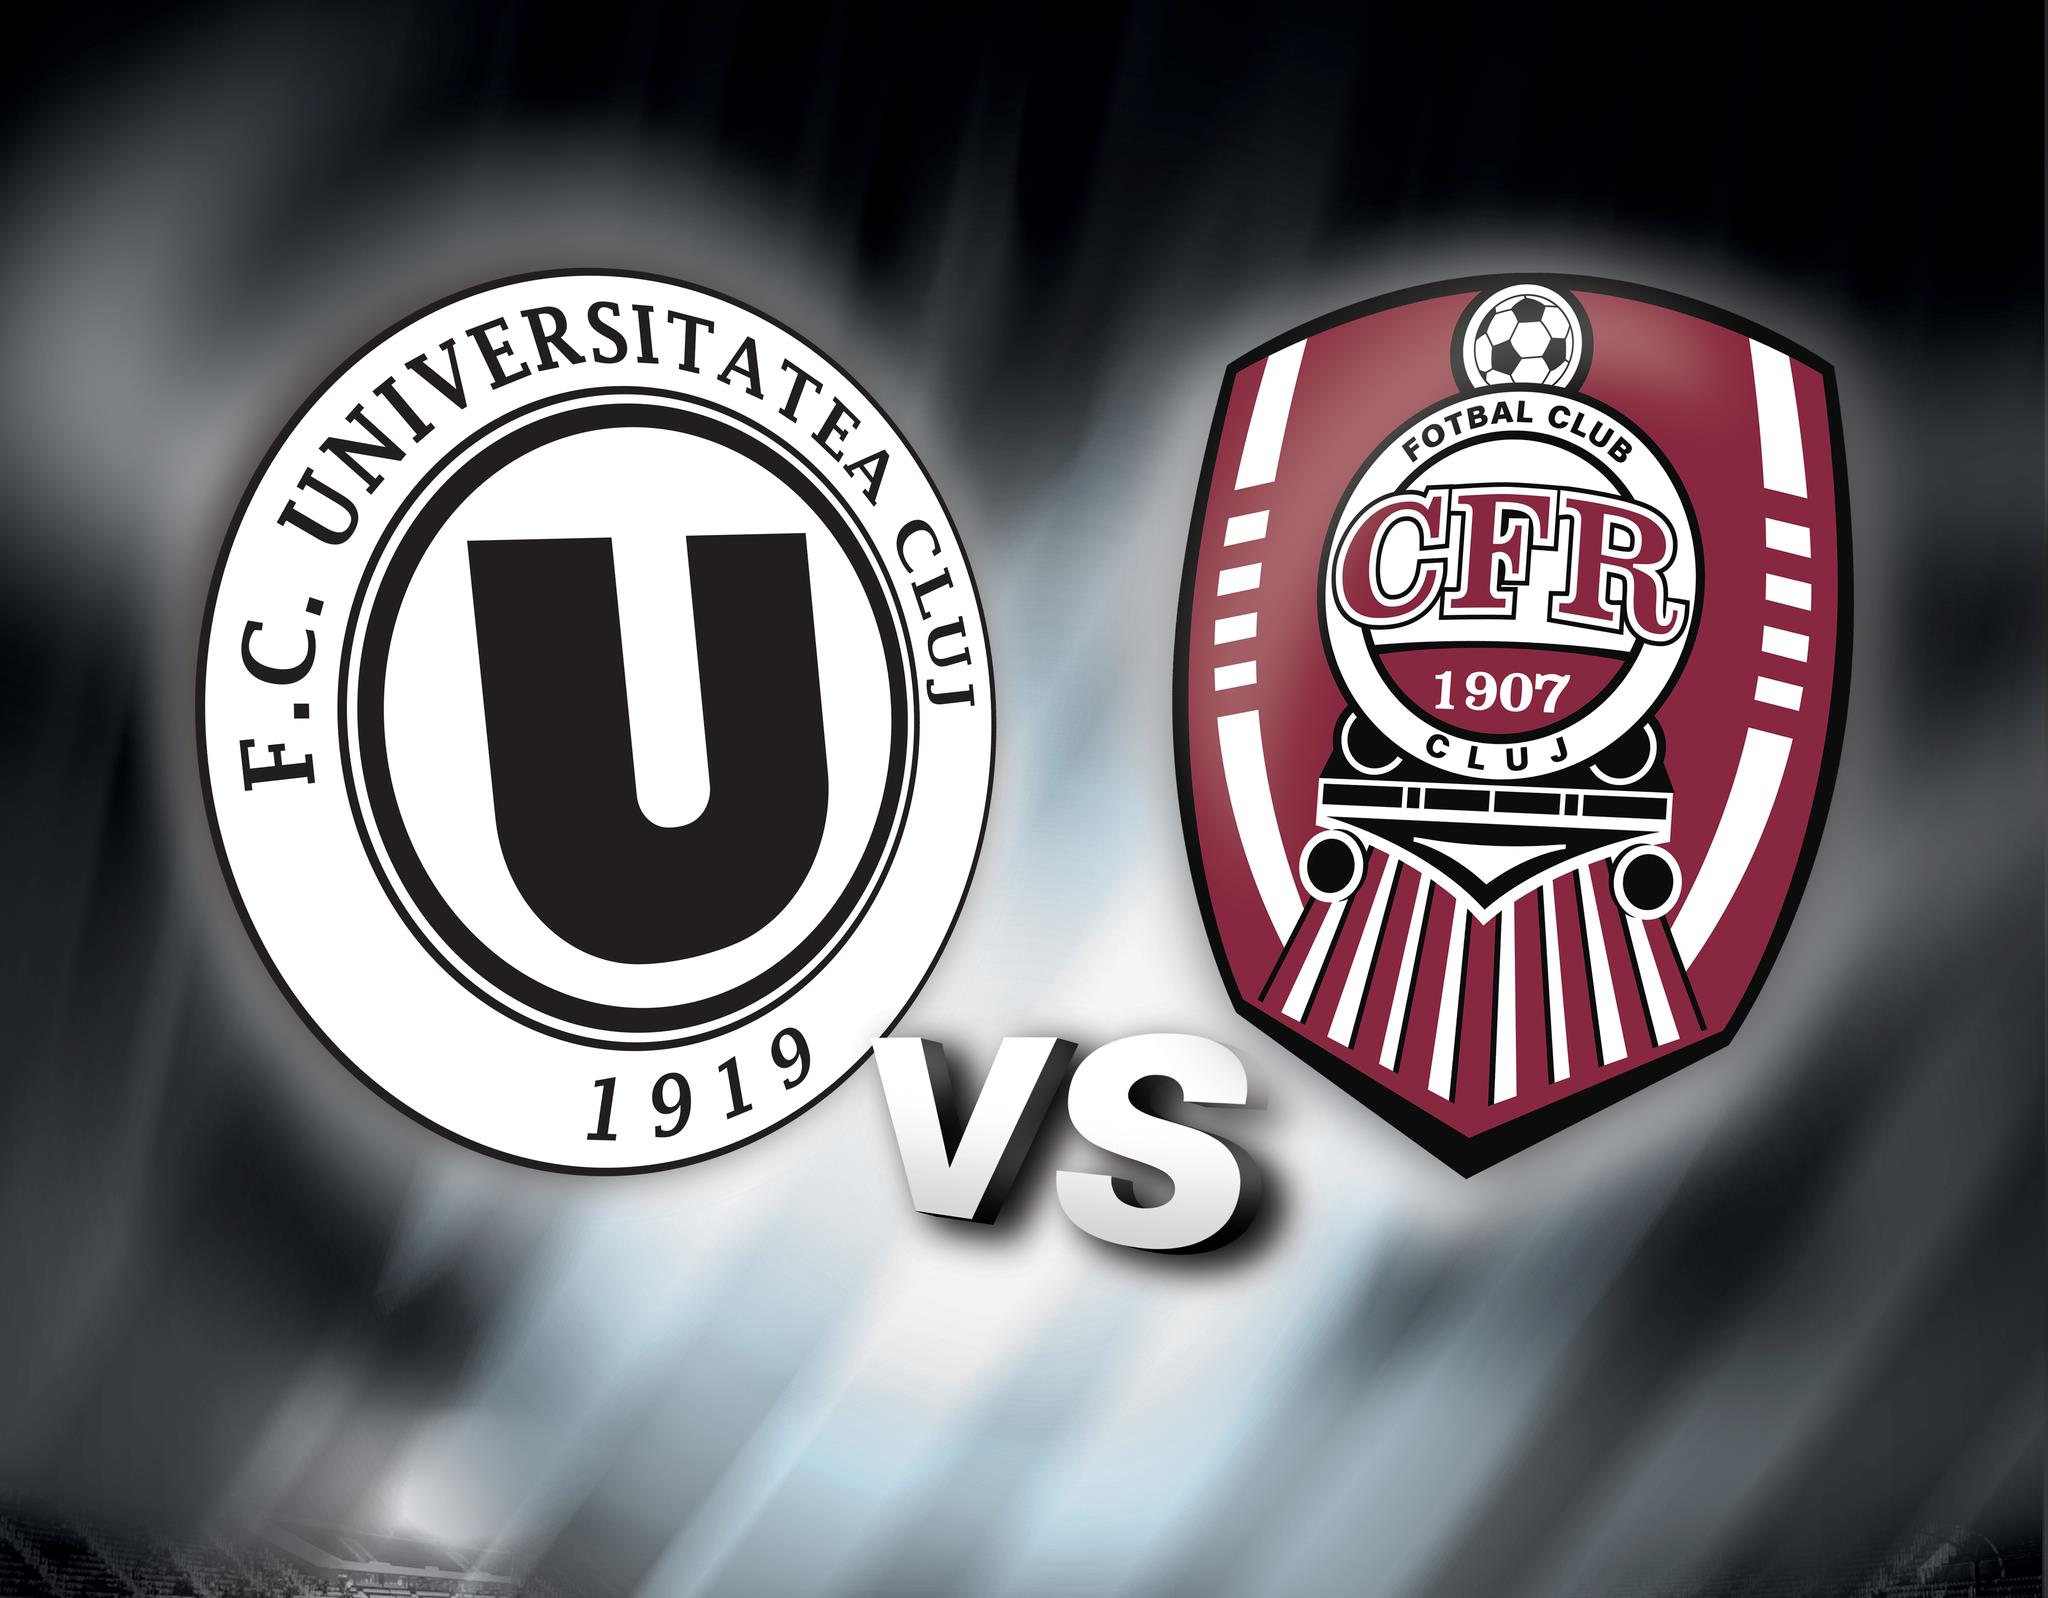 Universitatea Cluj vs. CFR 1907 Cluj @ Cluj Arena